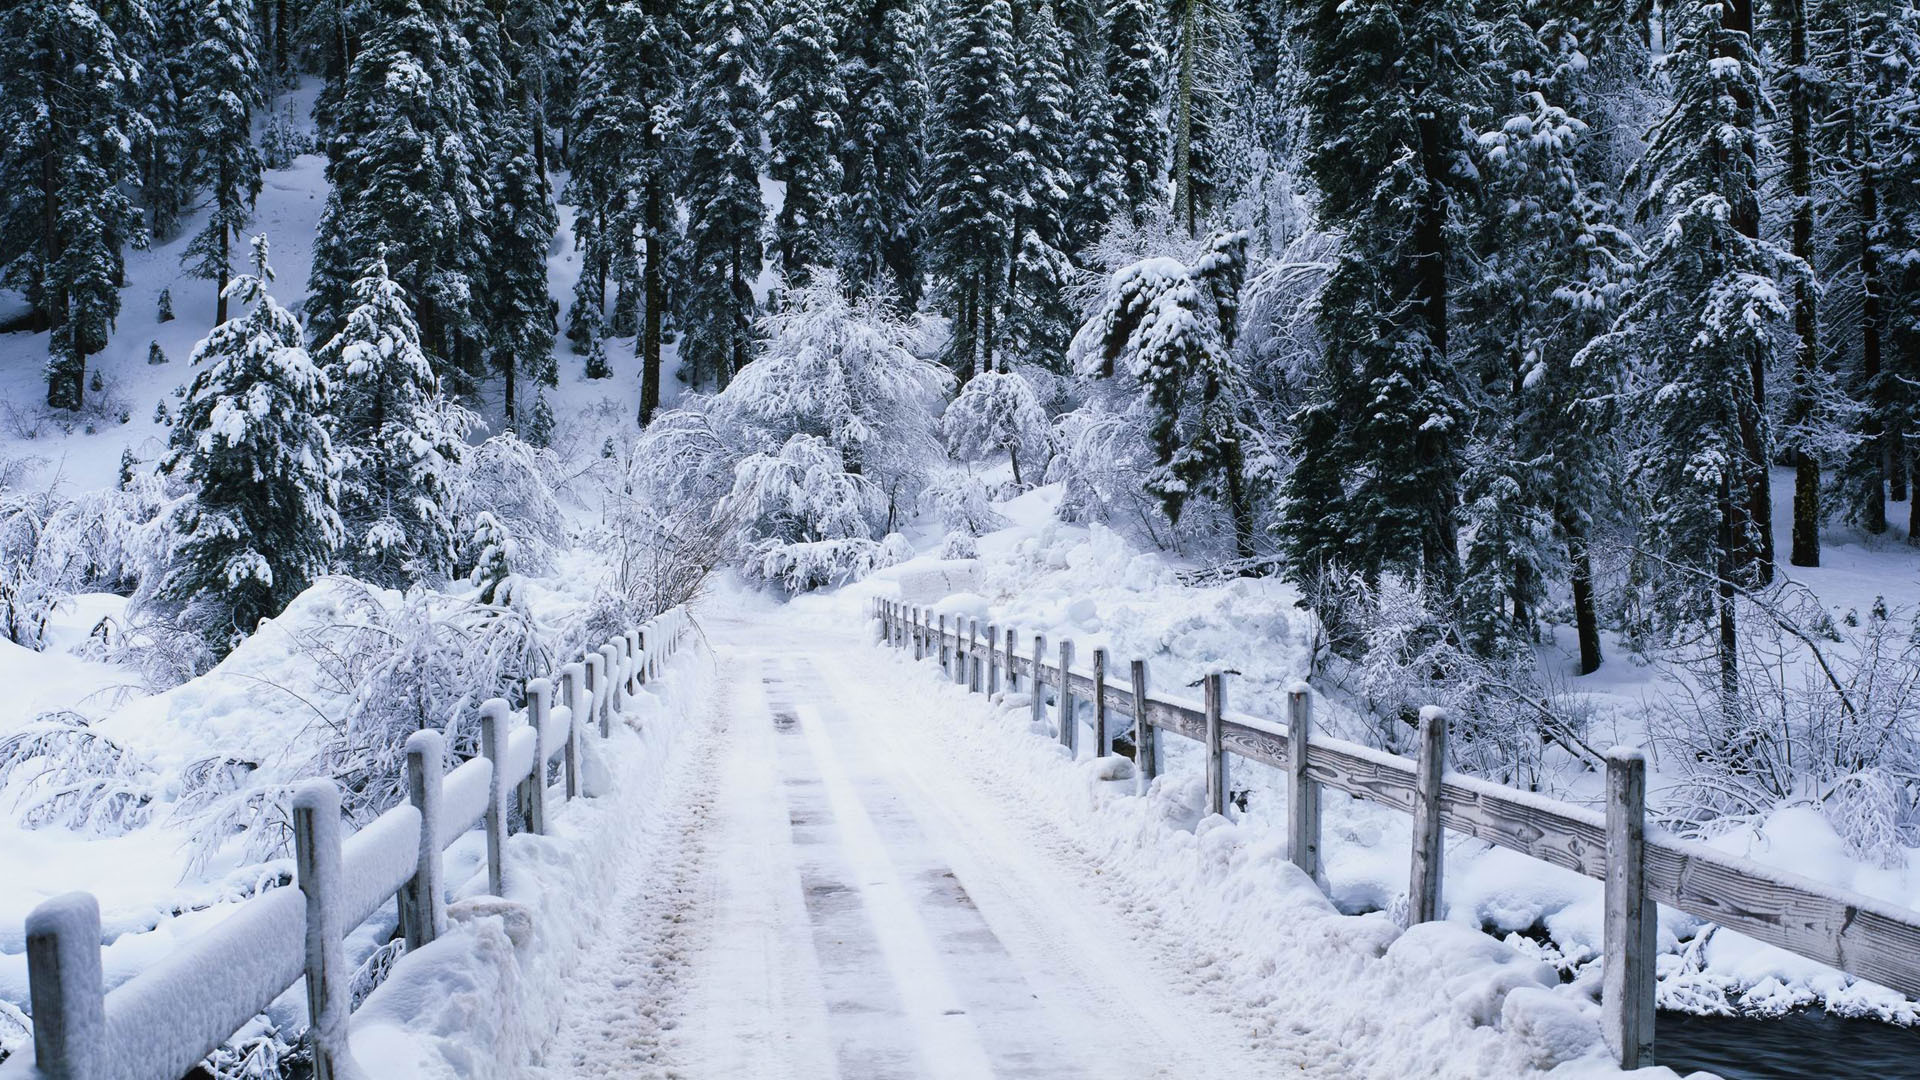 дорога снег лес зима без регистрации